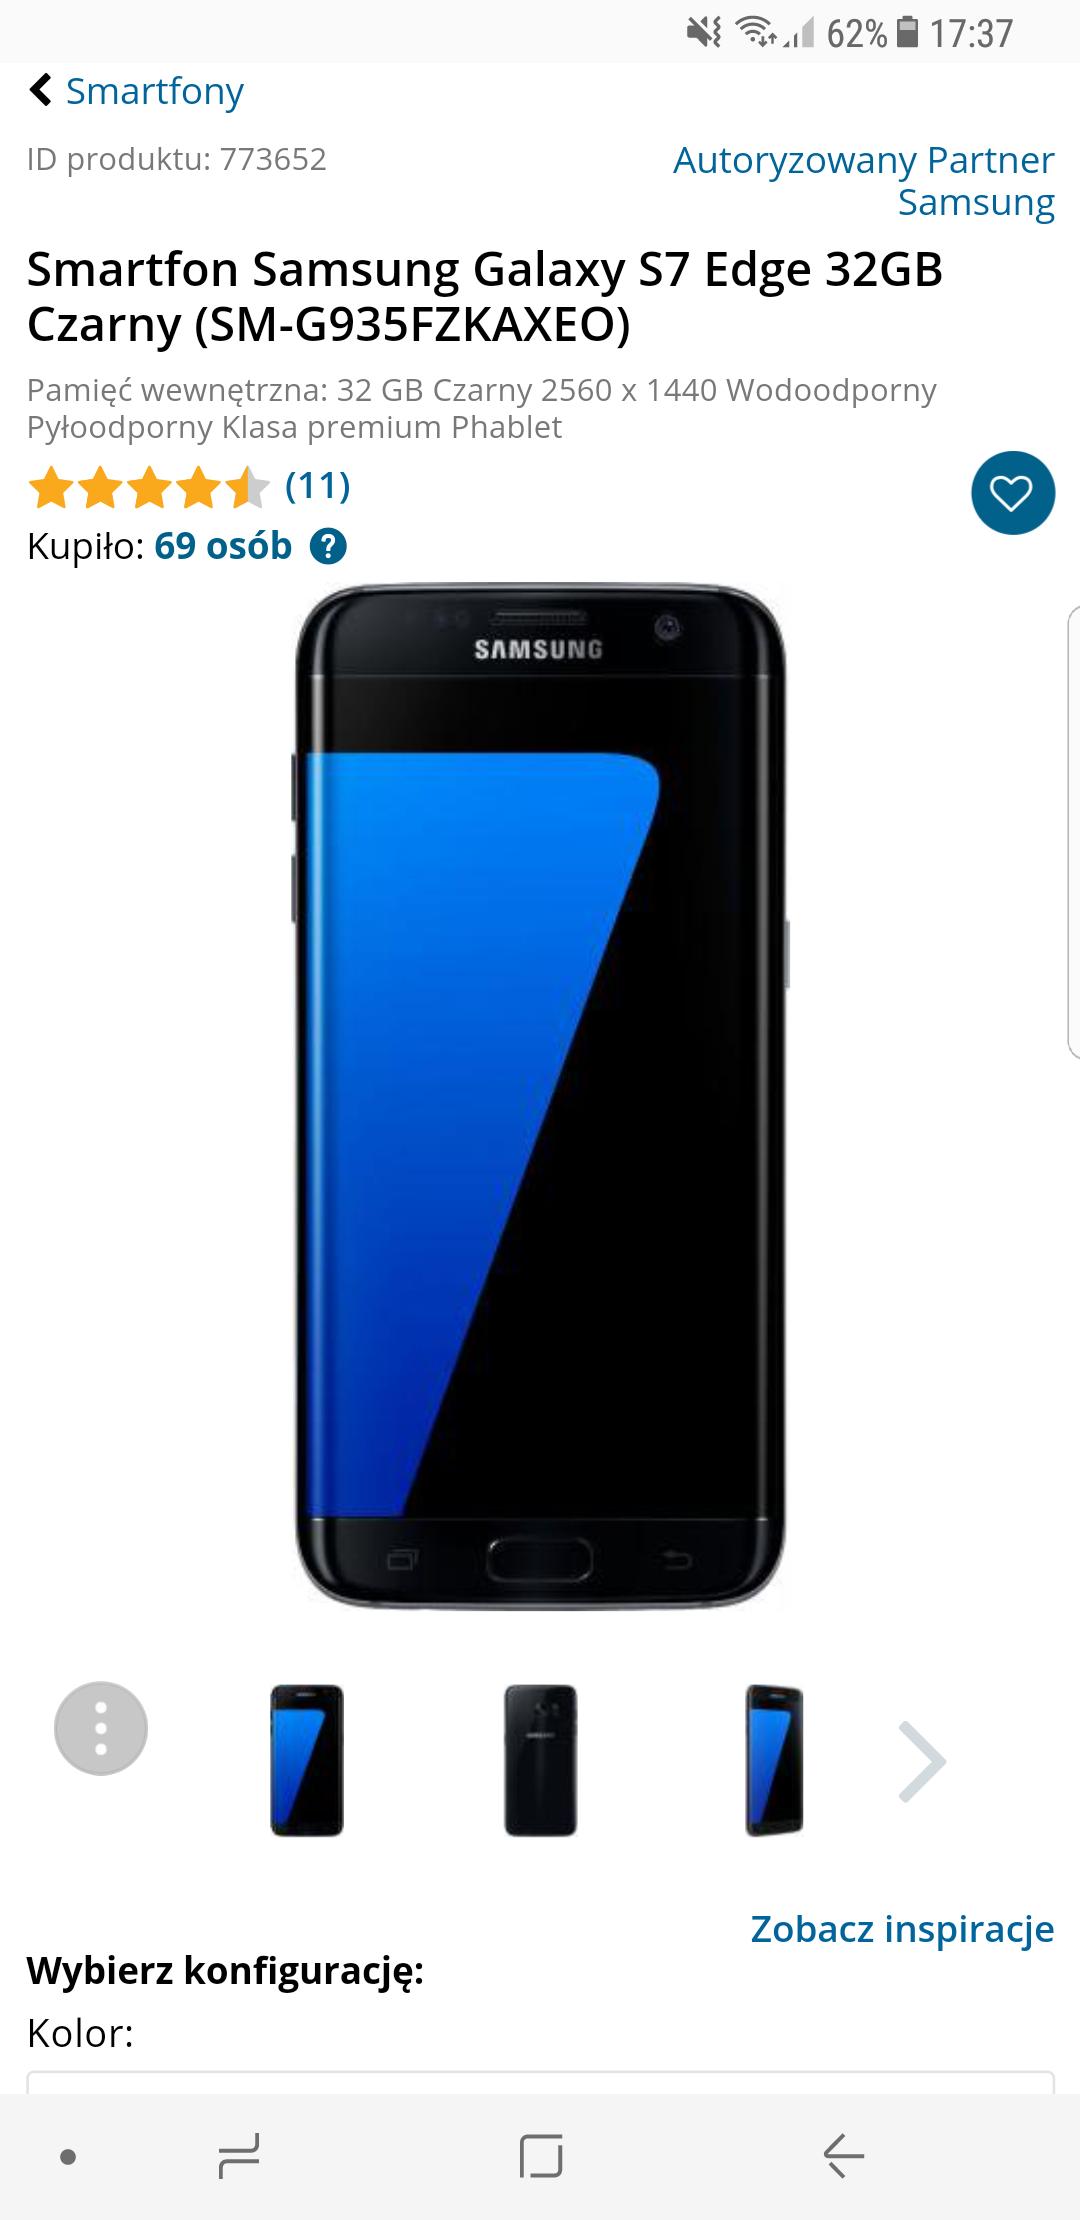 Samsung Galaxy s8, s7 edge,  A5, note 8, J7 morele net